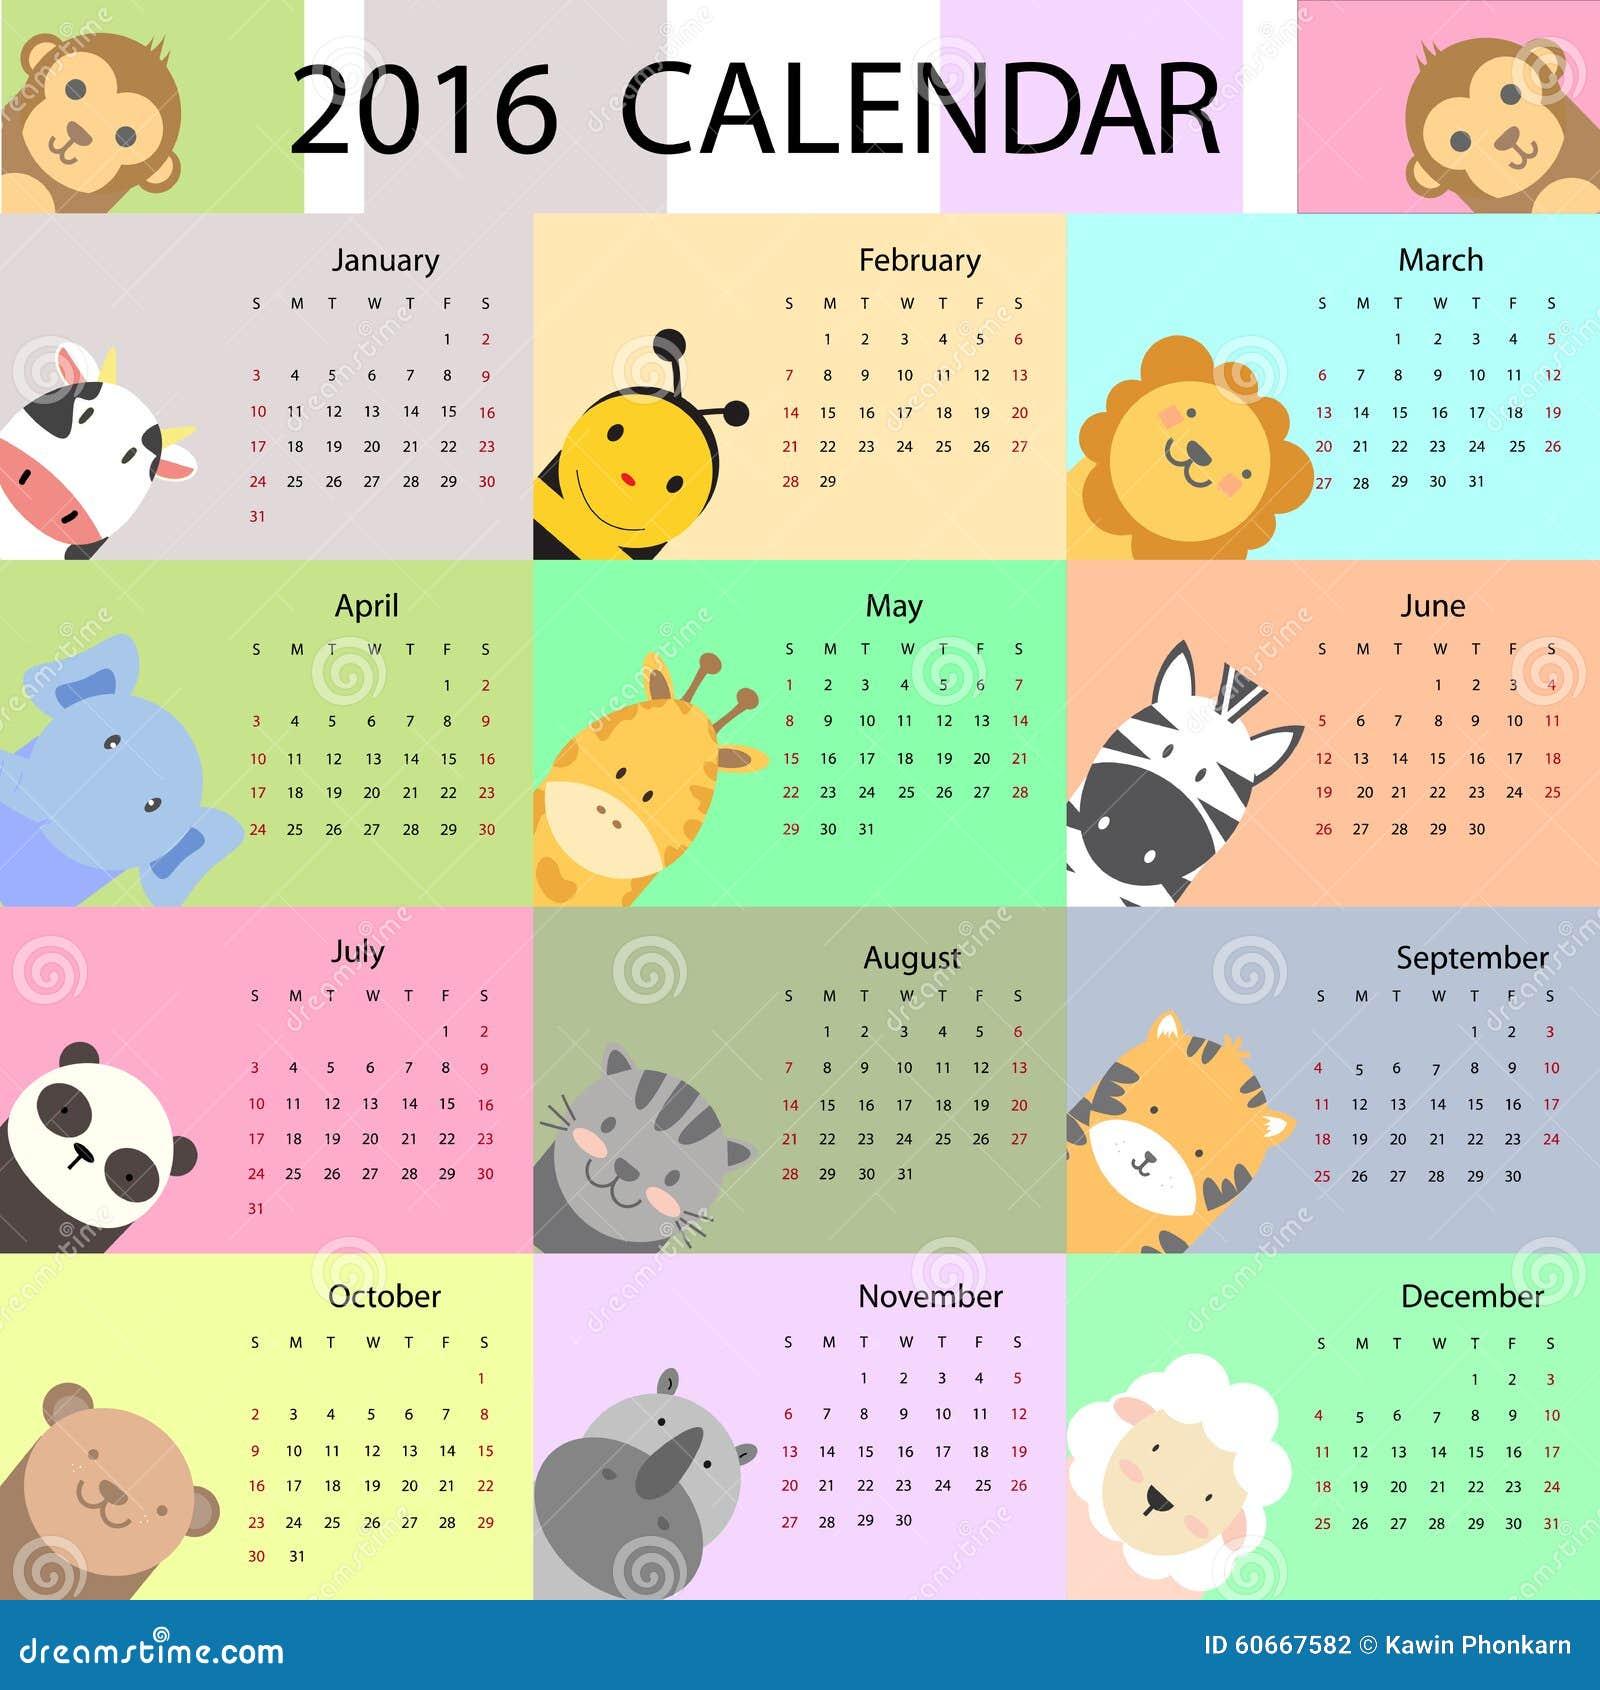 Calendar Design Illustrator : Cute calendar stock vector image